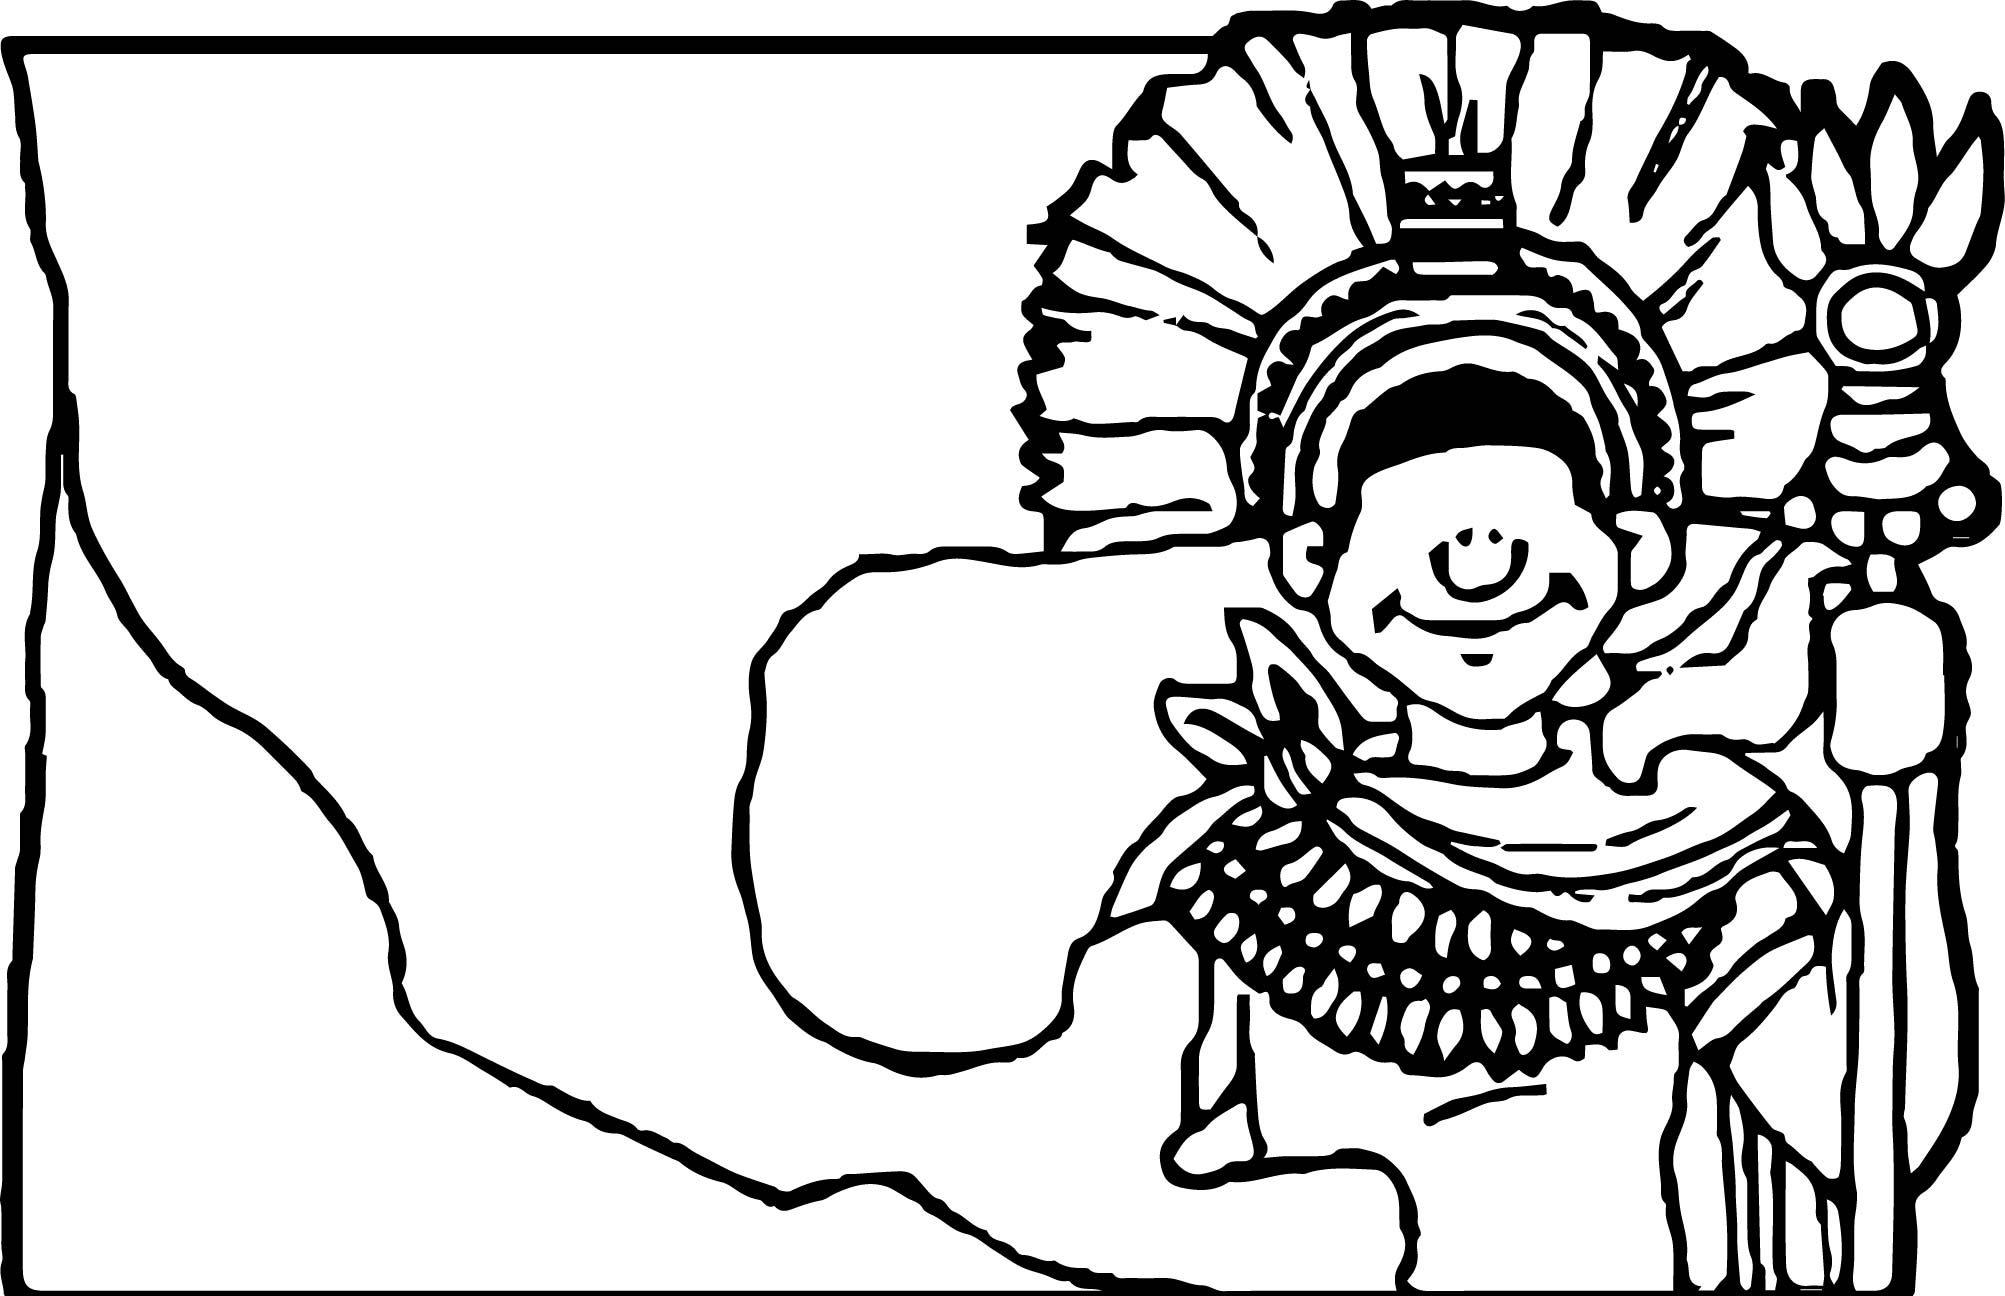 Banner Aztecs Coloring Page